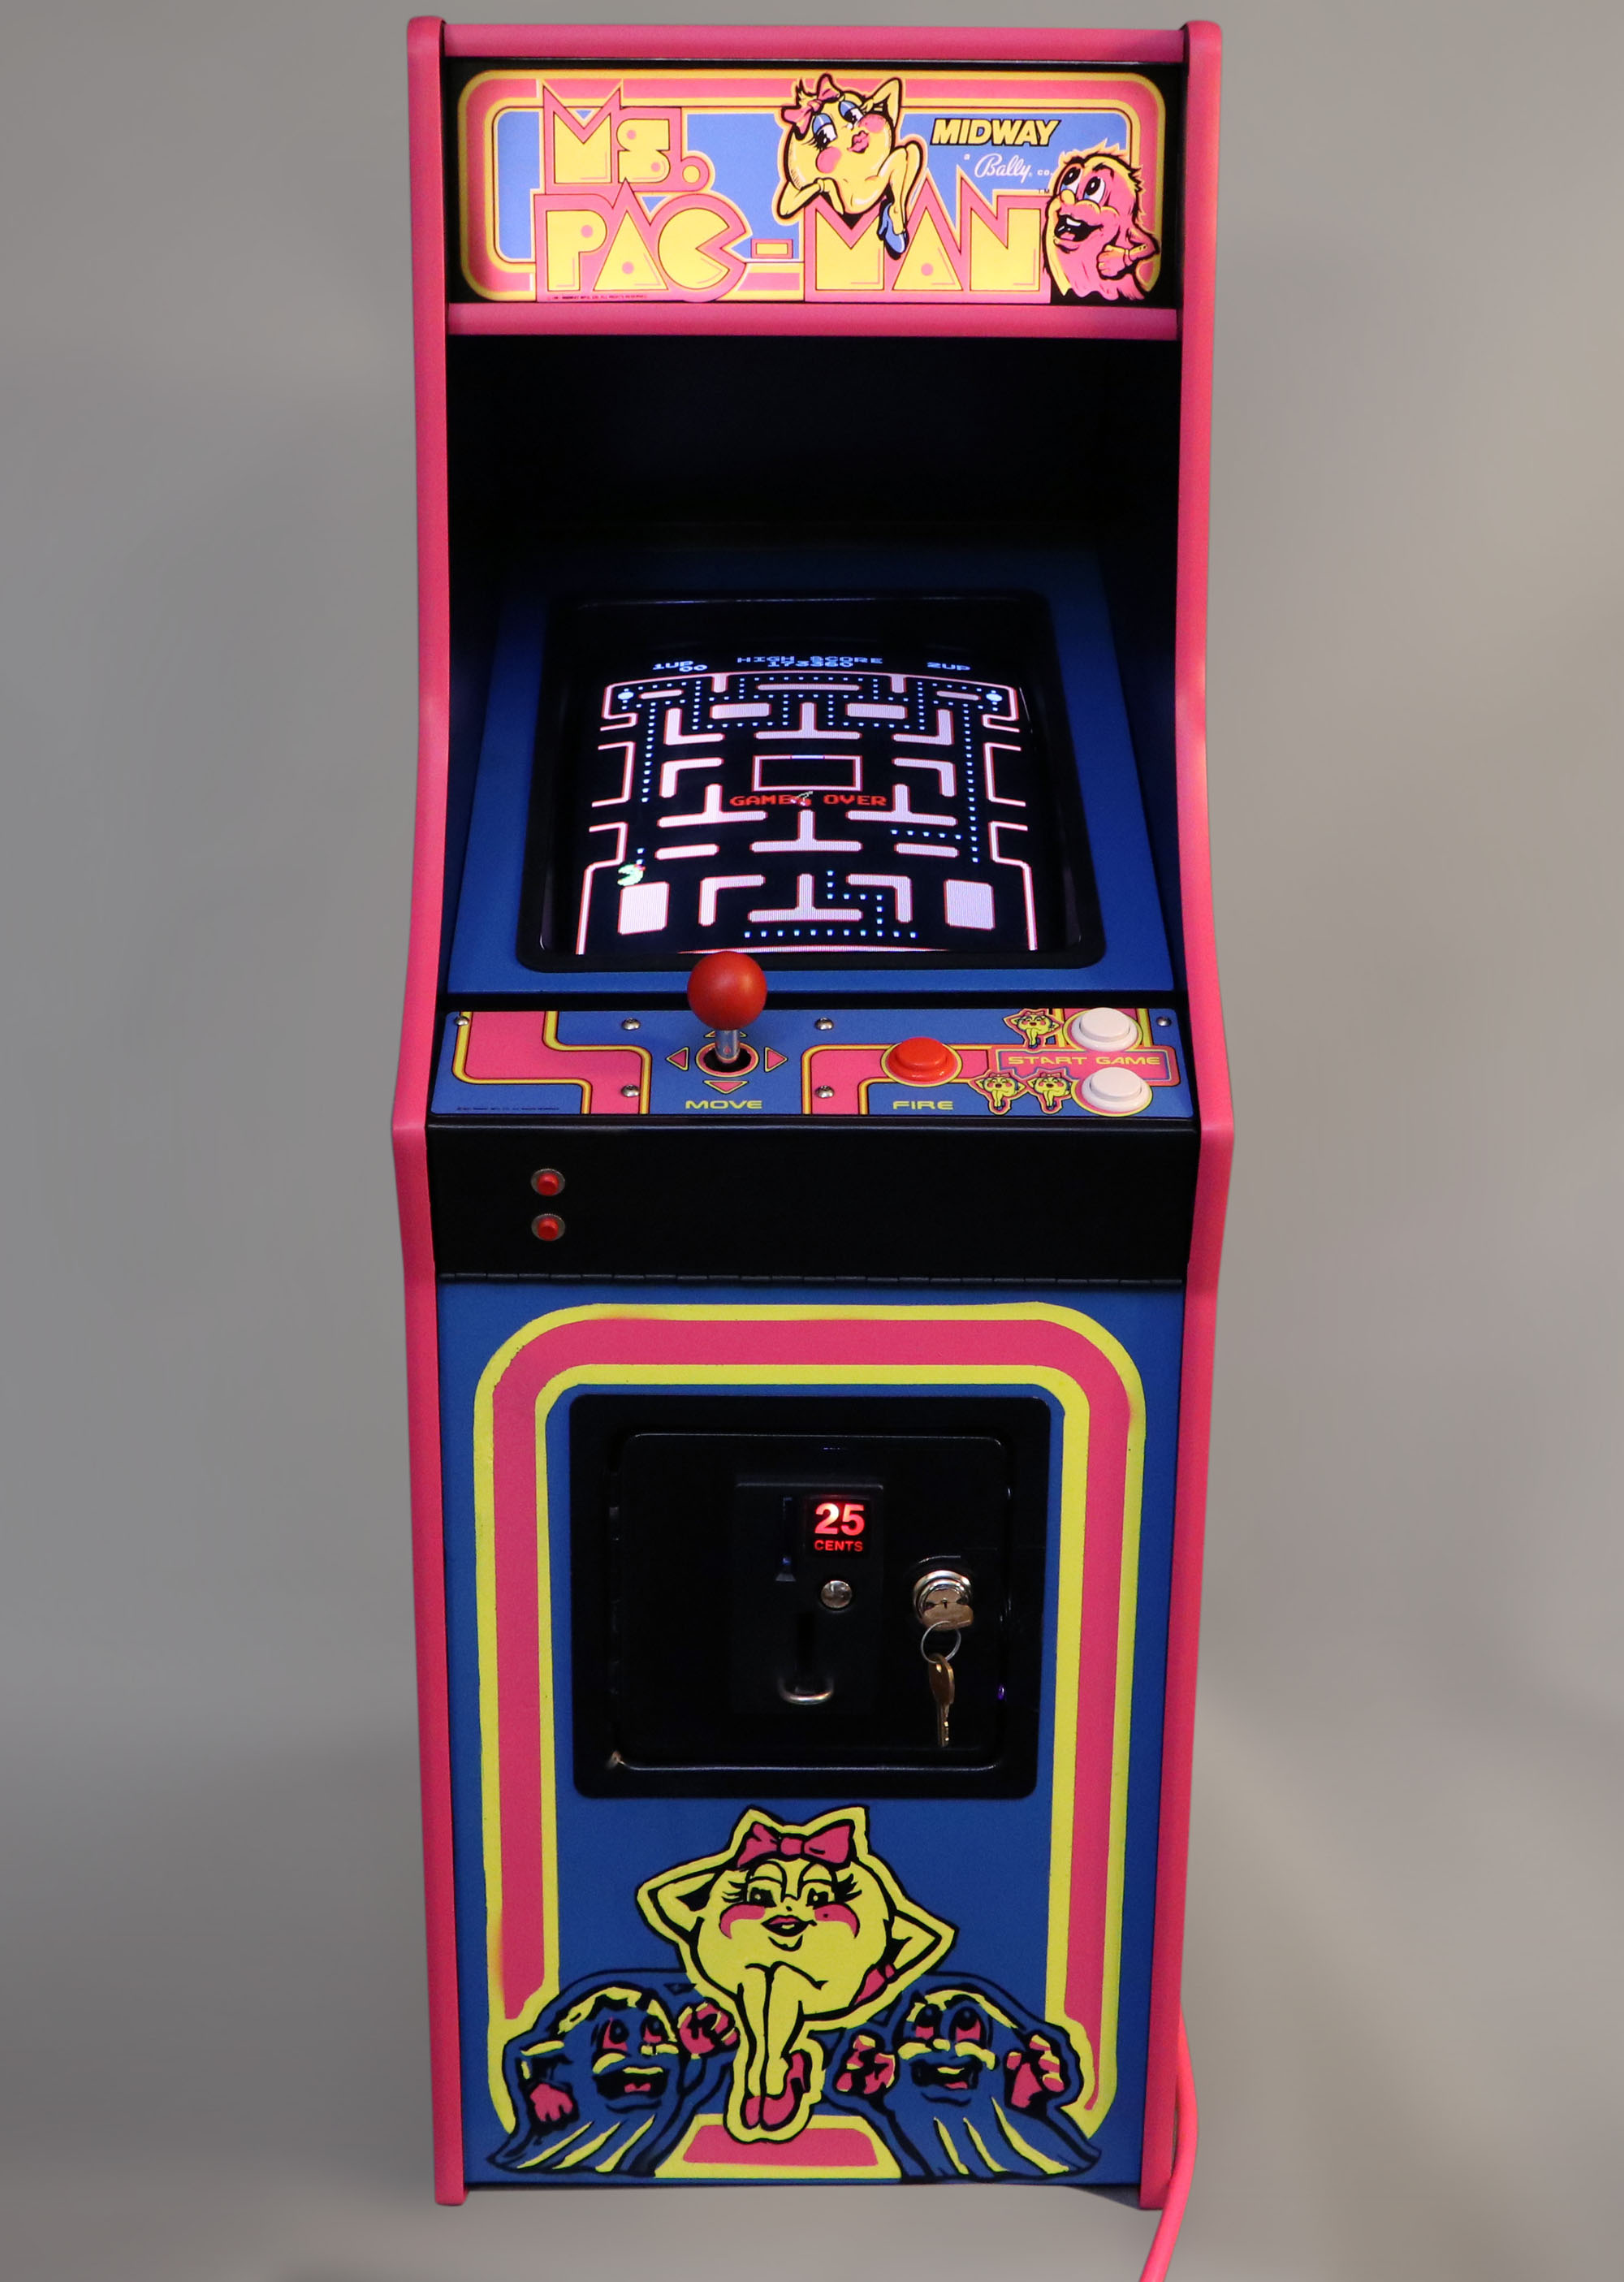 Ms Pac Man Galaga Small Change Arcade